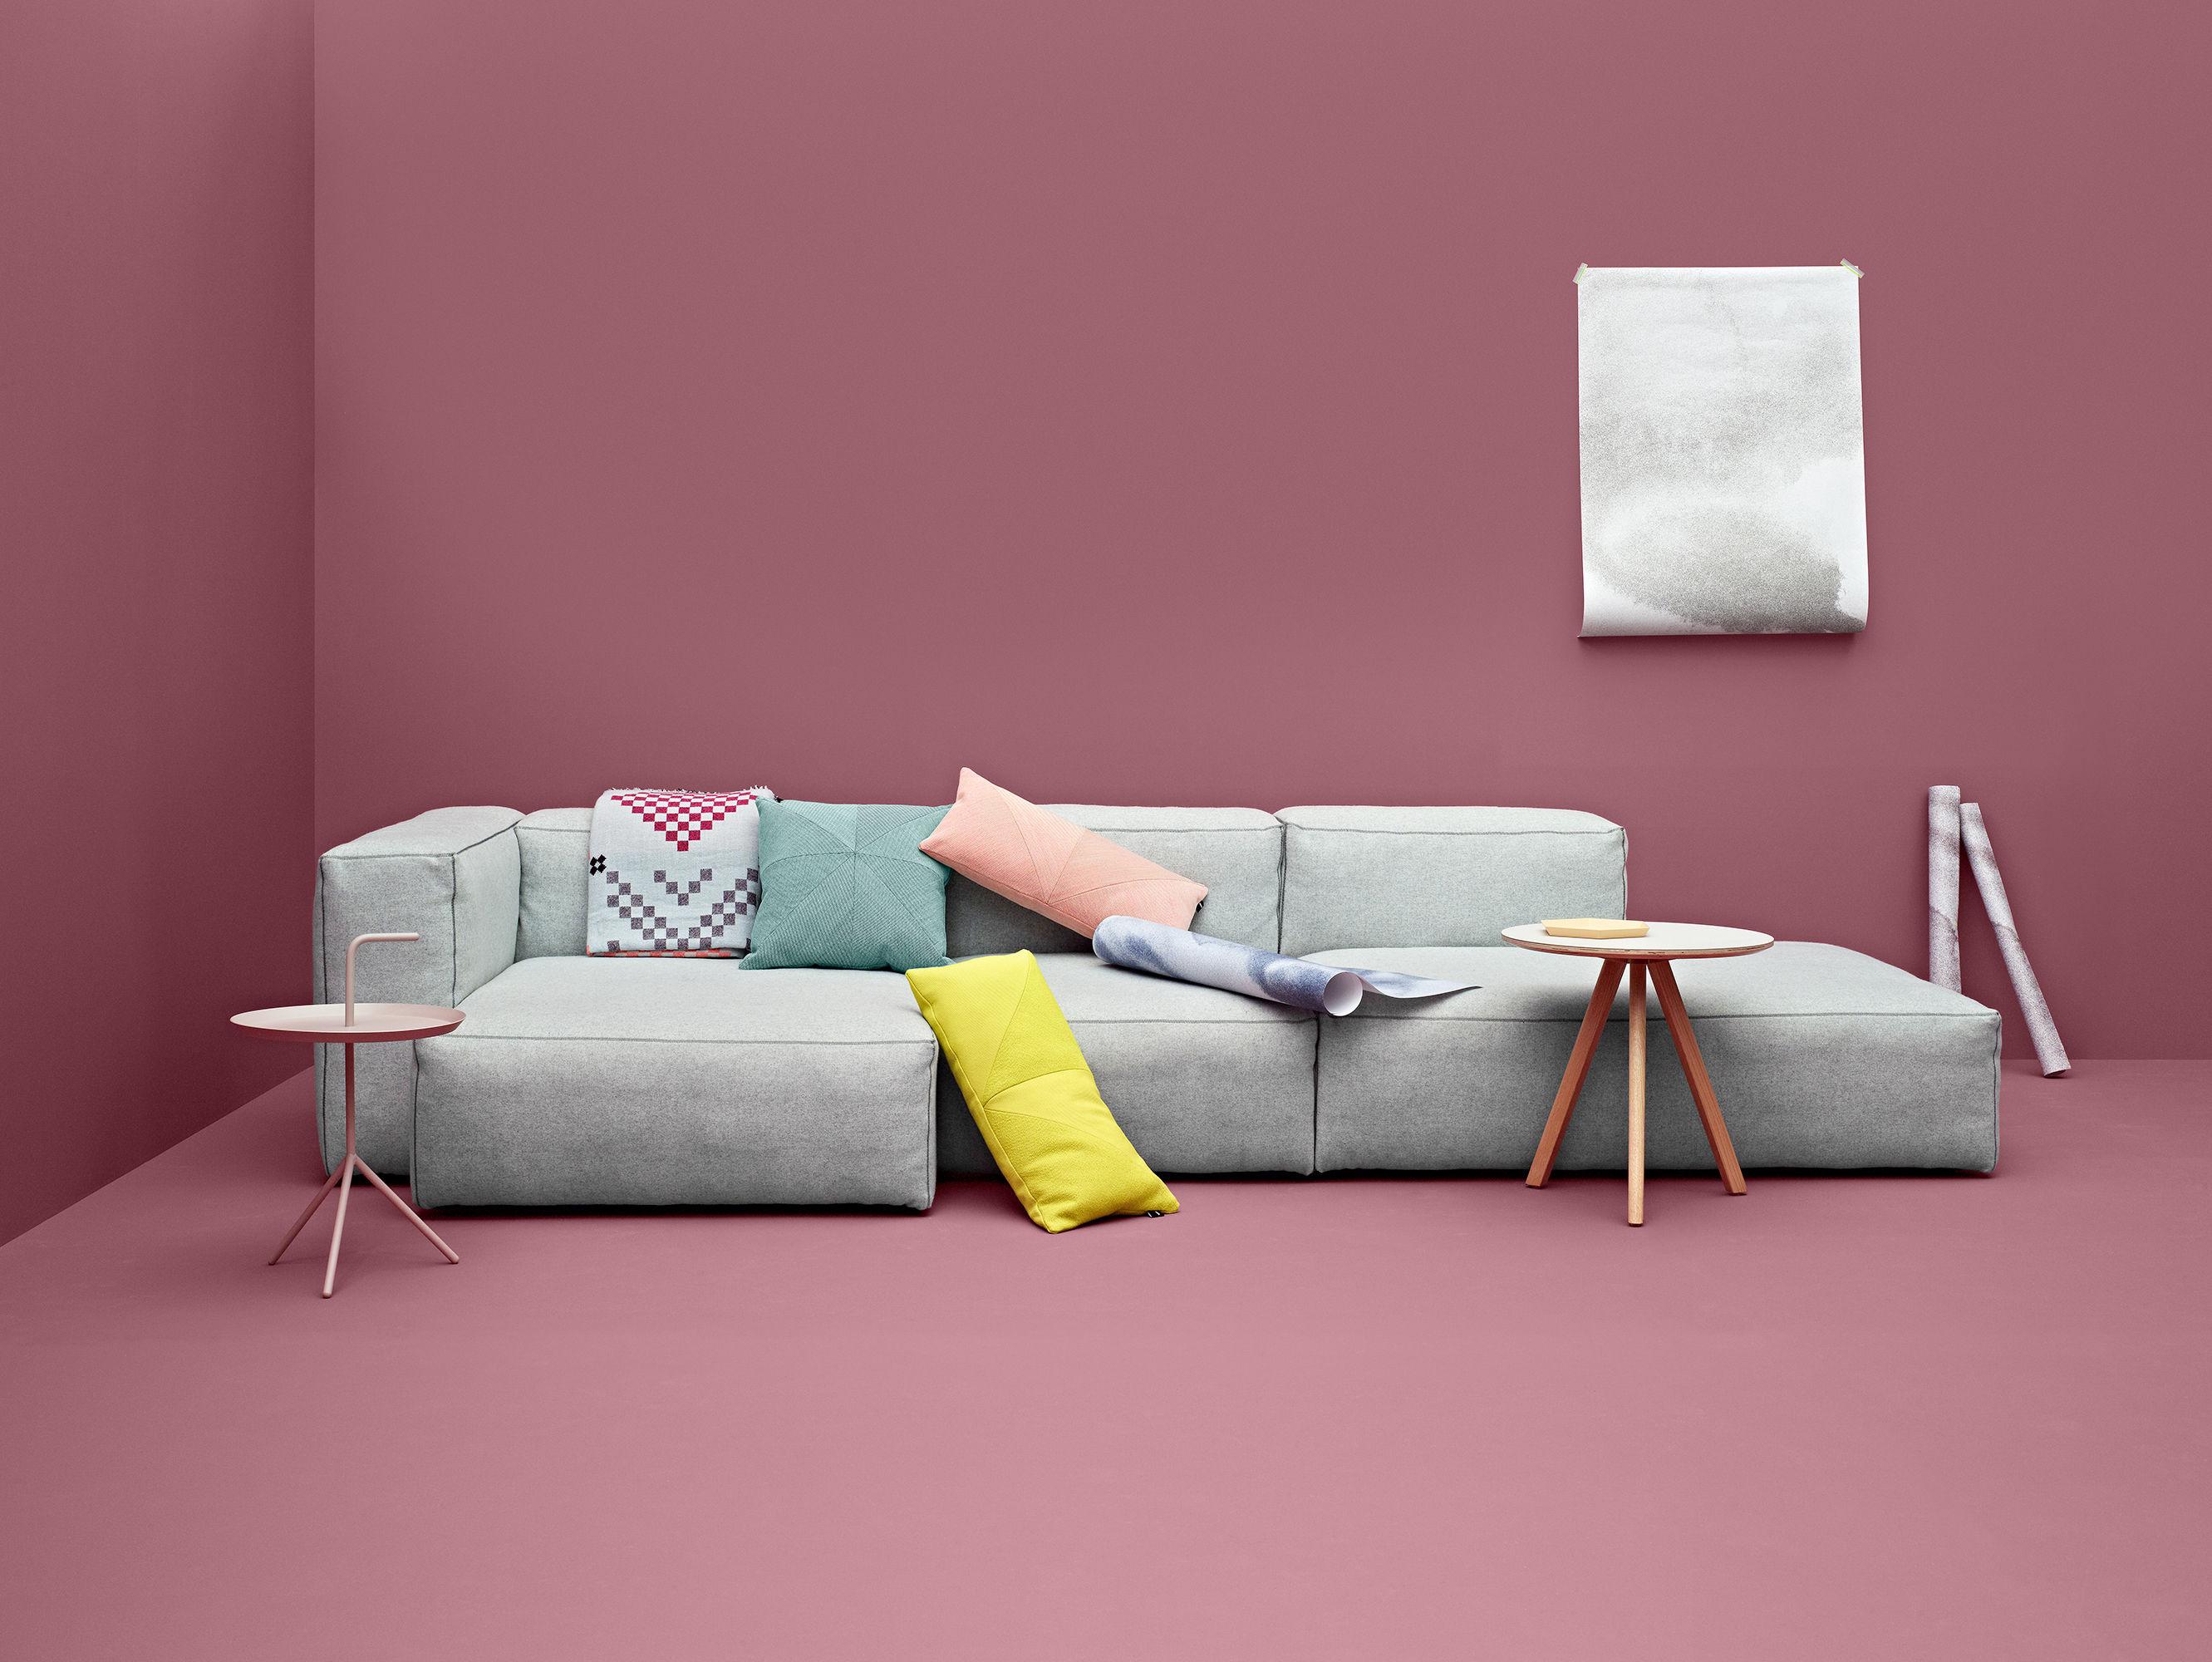 canap d 39 angle soft mags l 302 cm accoudoir gauche gris clair tissu divina hay. Black Bedroom Furniture Sets. Home Design Ideas